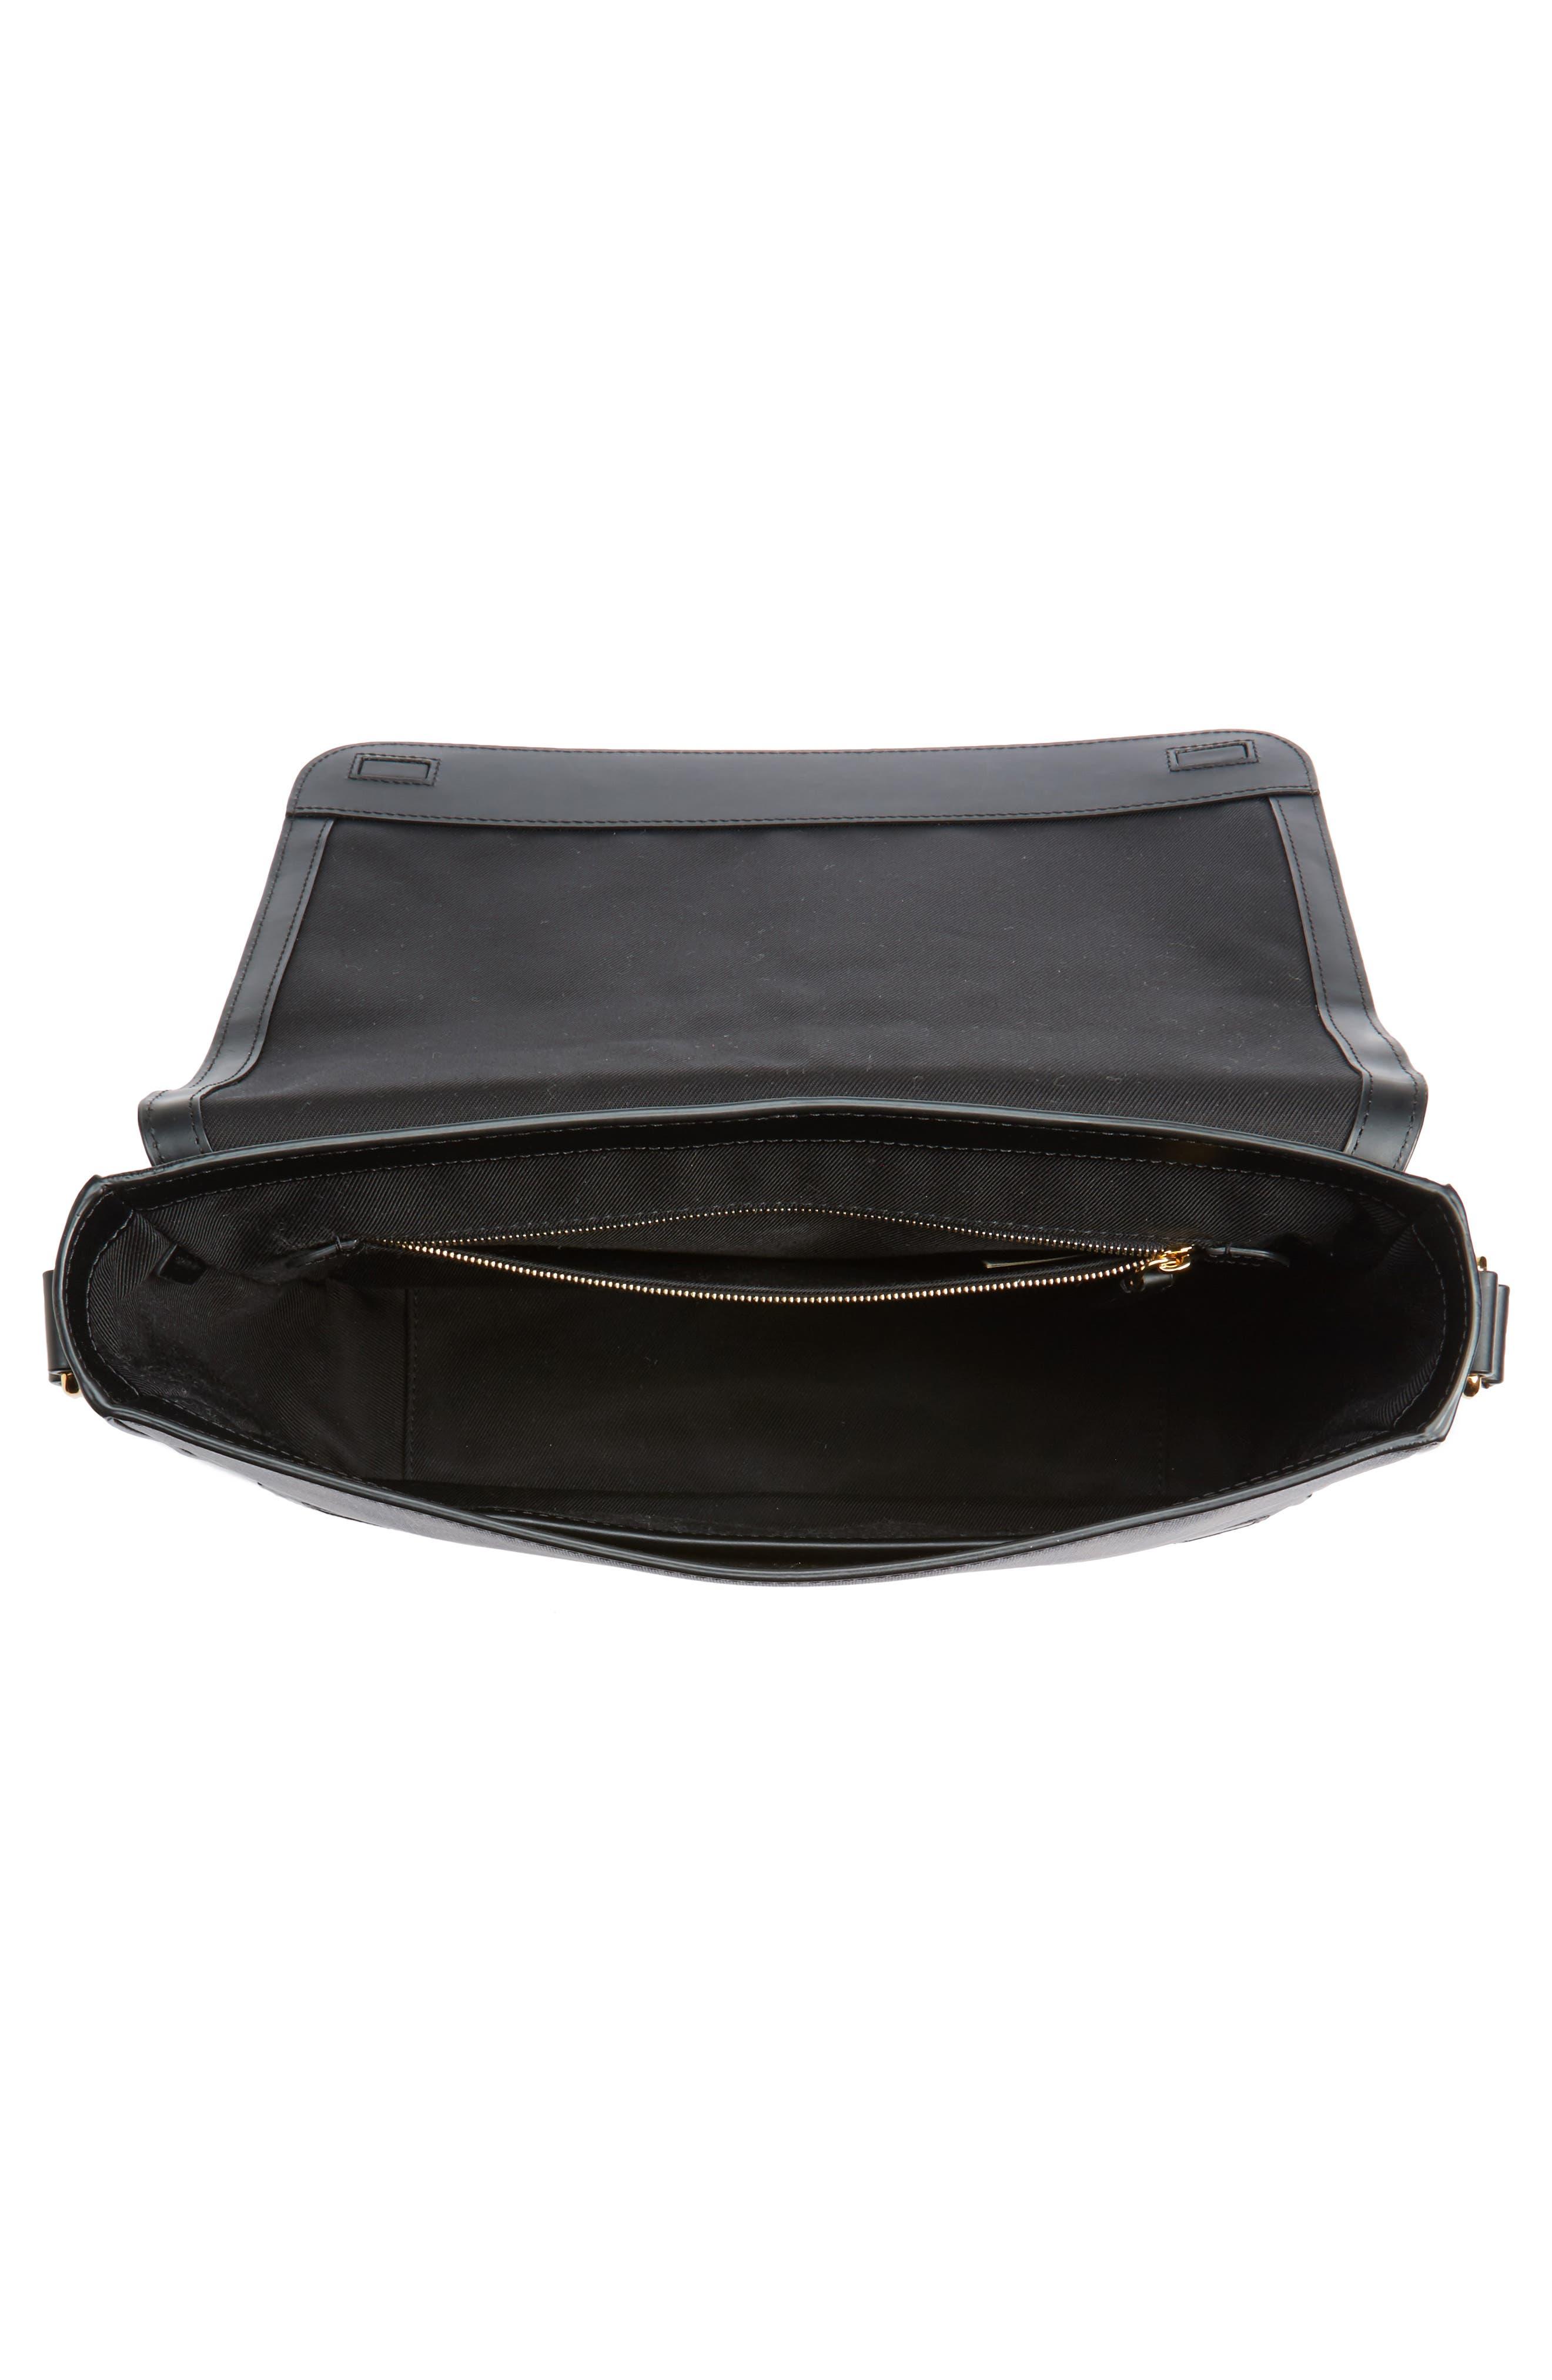 Edgware Check Messenger Bag,                             Alternate thumbnail 4, color,                             Chocolate/ Black